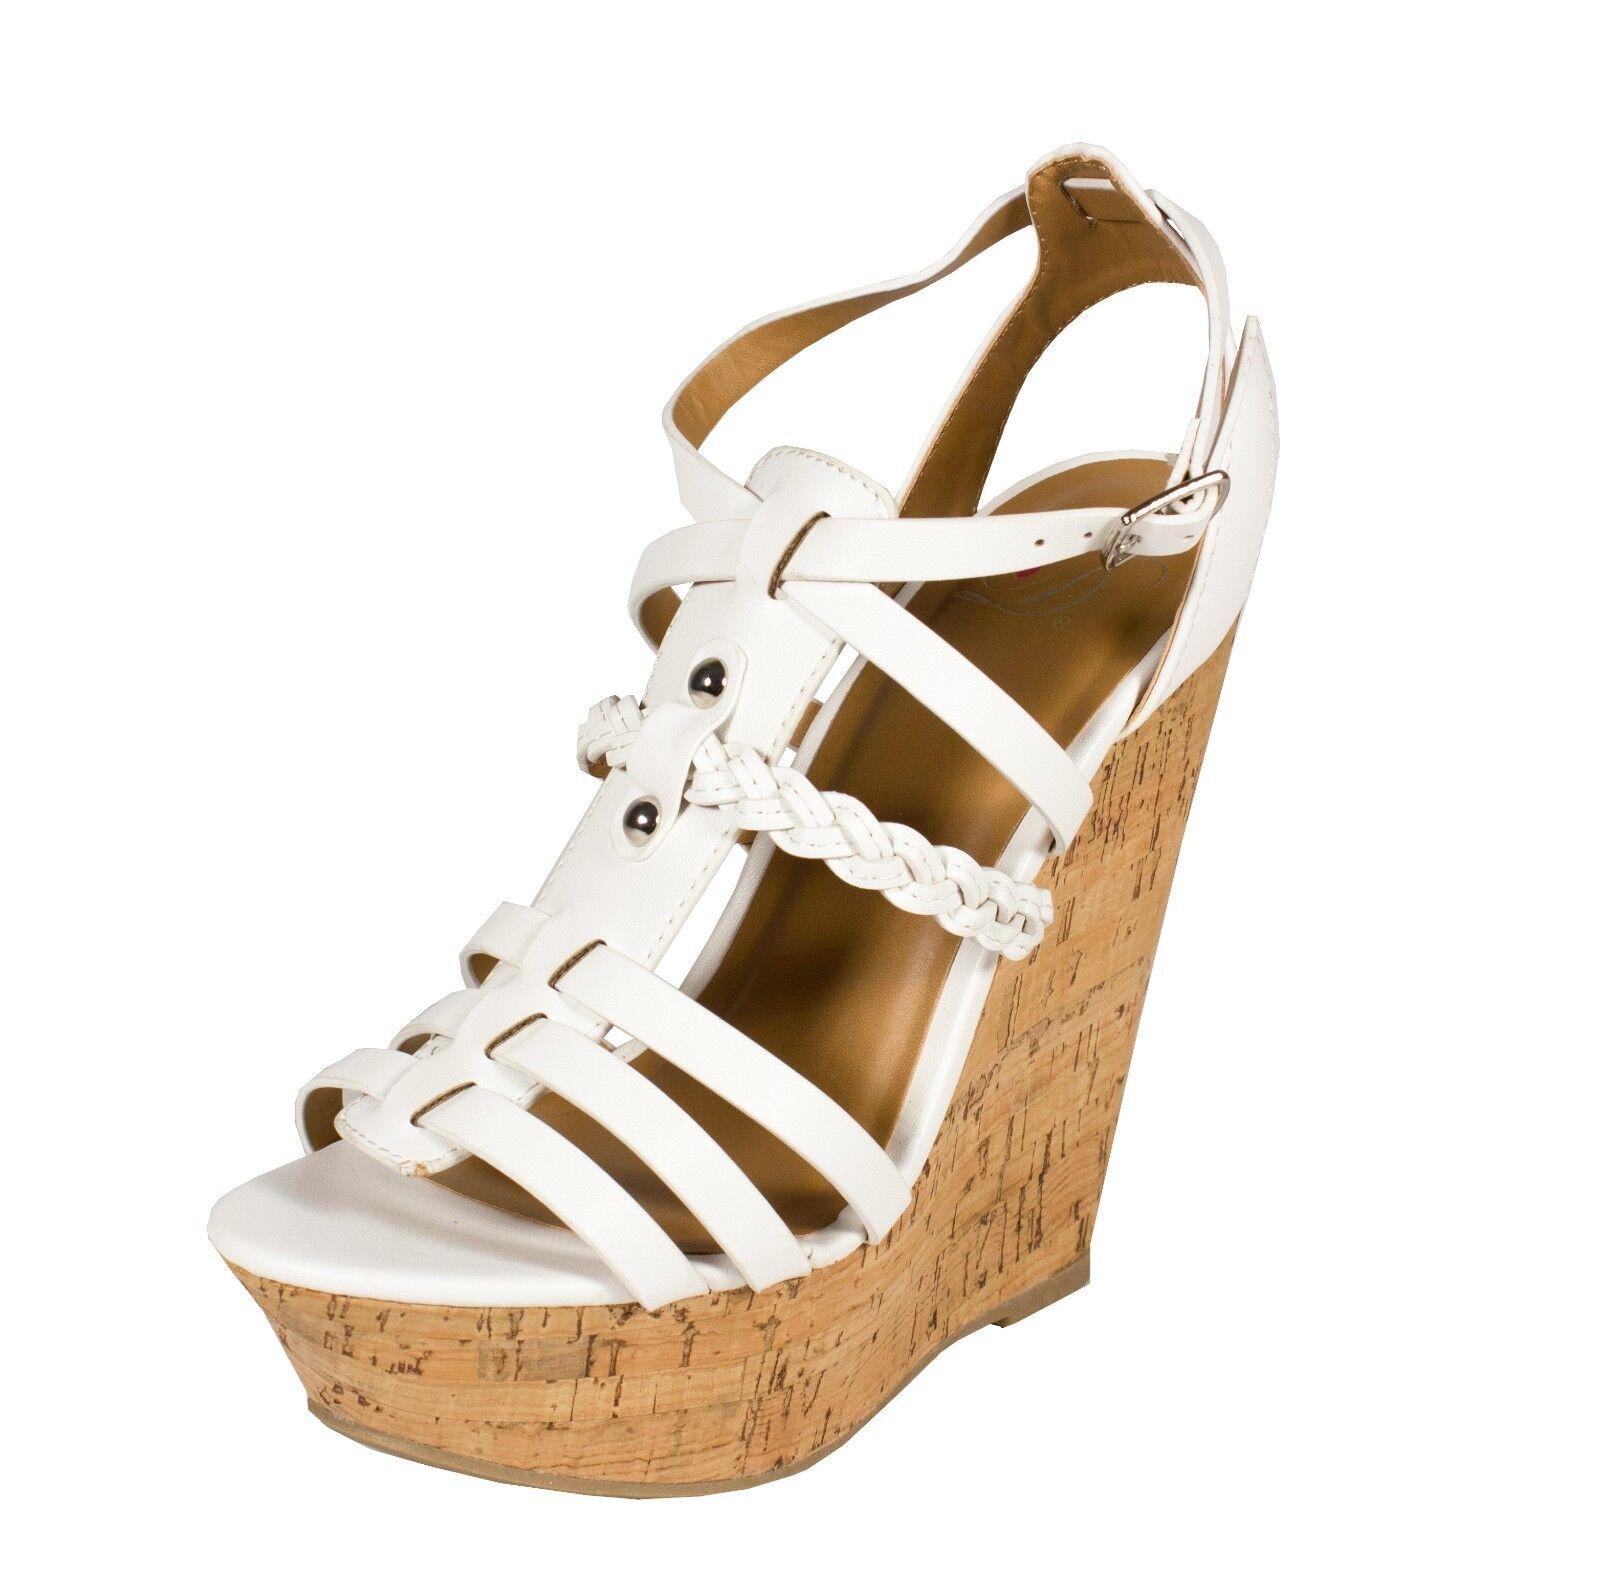 Spine! Delicious Peep Toe Strappy Platform Heel Wedge Sandal White White Sandal Leatherette f379c7